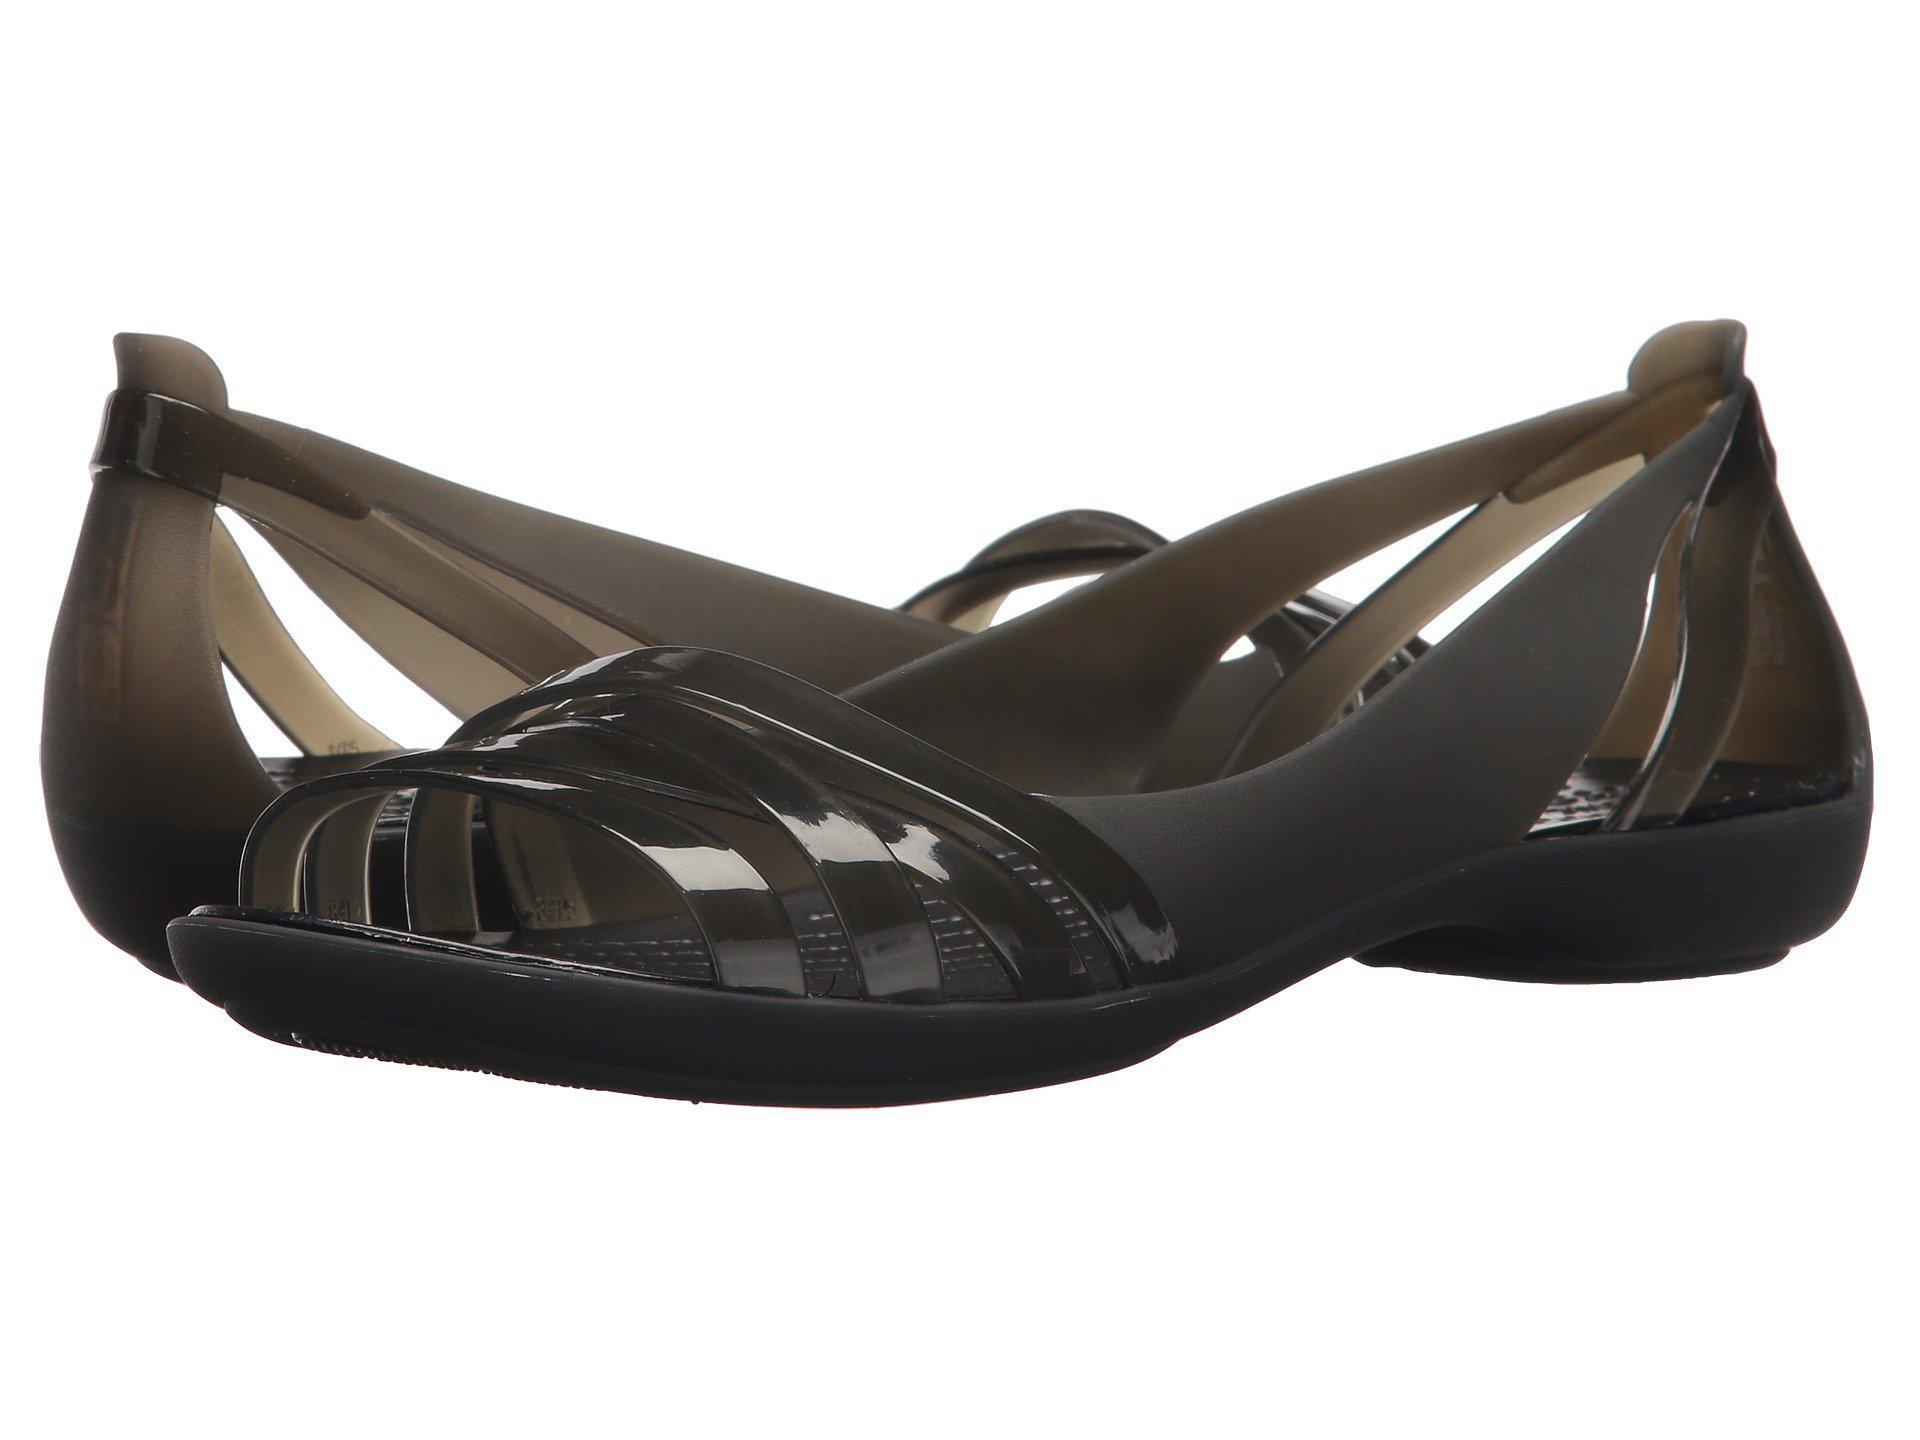 ea74729da07a Lyst - Crocs™ Isabella Huarache 2 Flat in Black